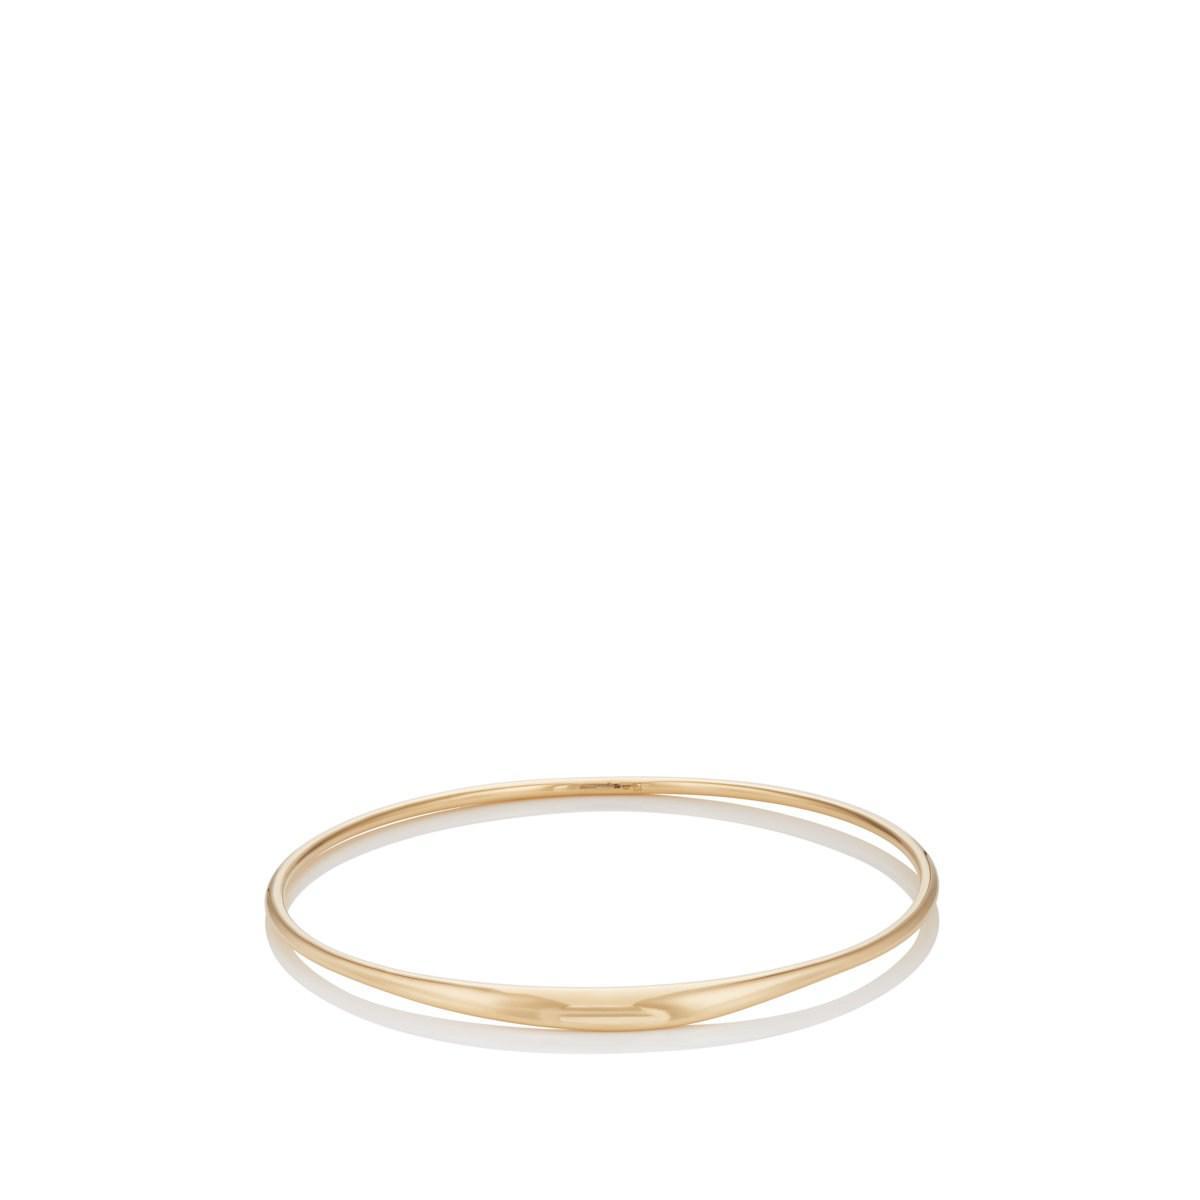 9354ba85a Lyst - TEJEN Yellow Gold Small Bangle in Metallic